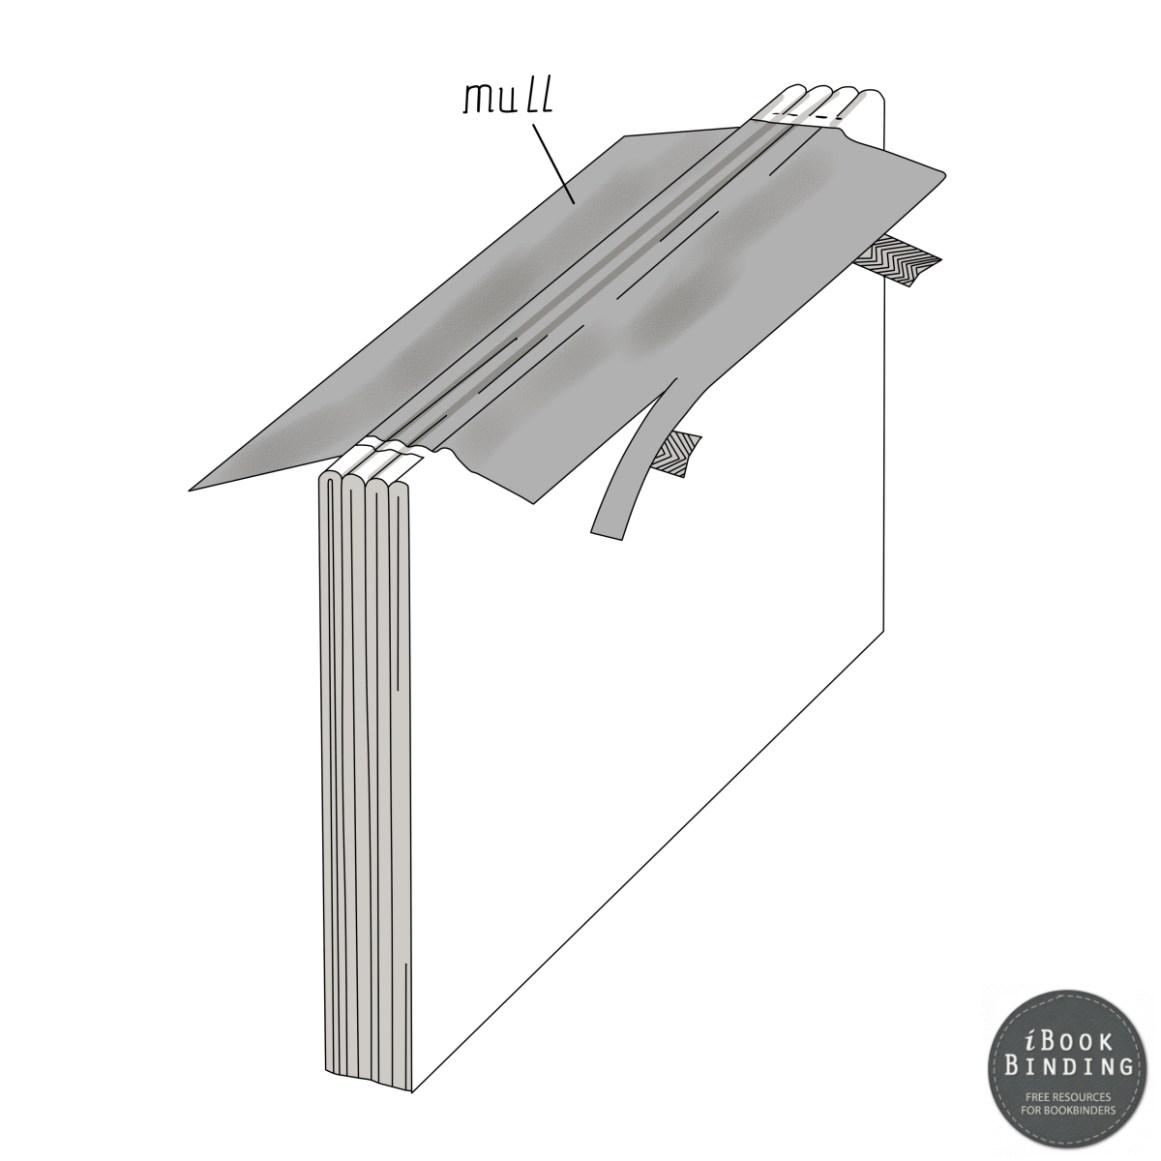 Figure 139 - Applying the Mull